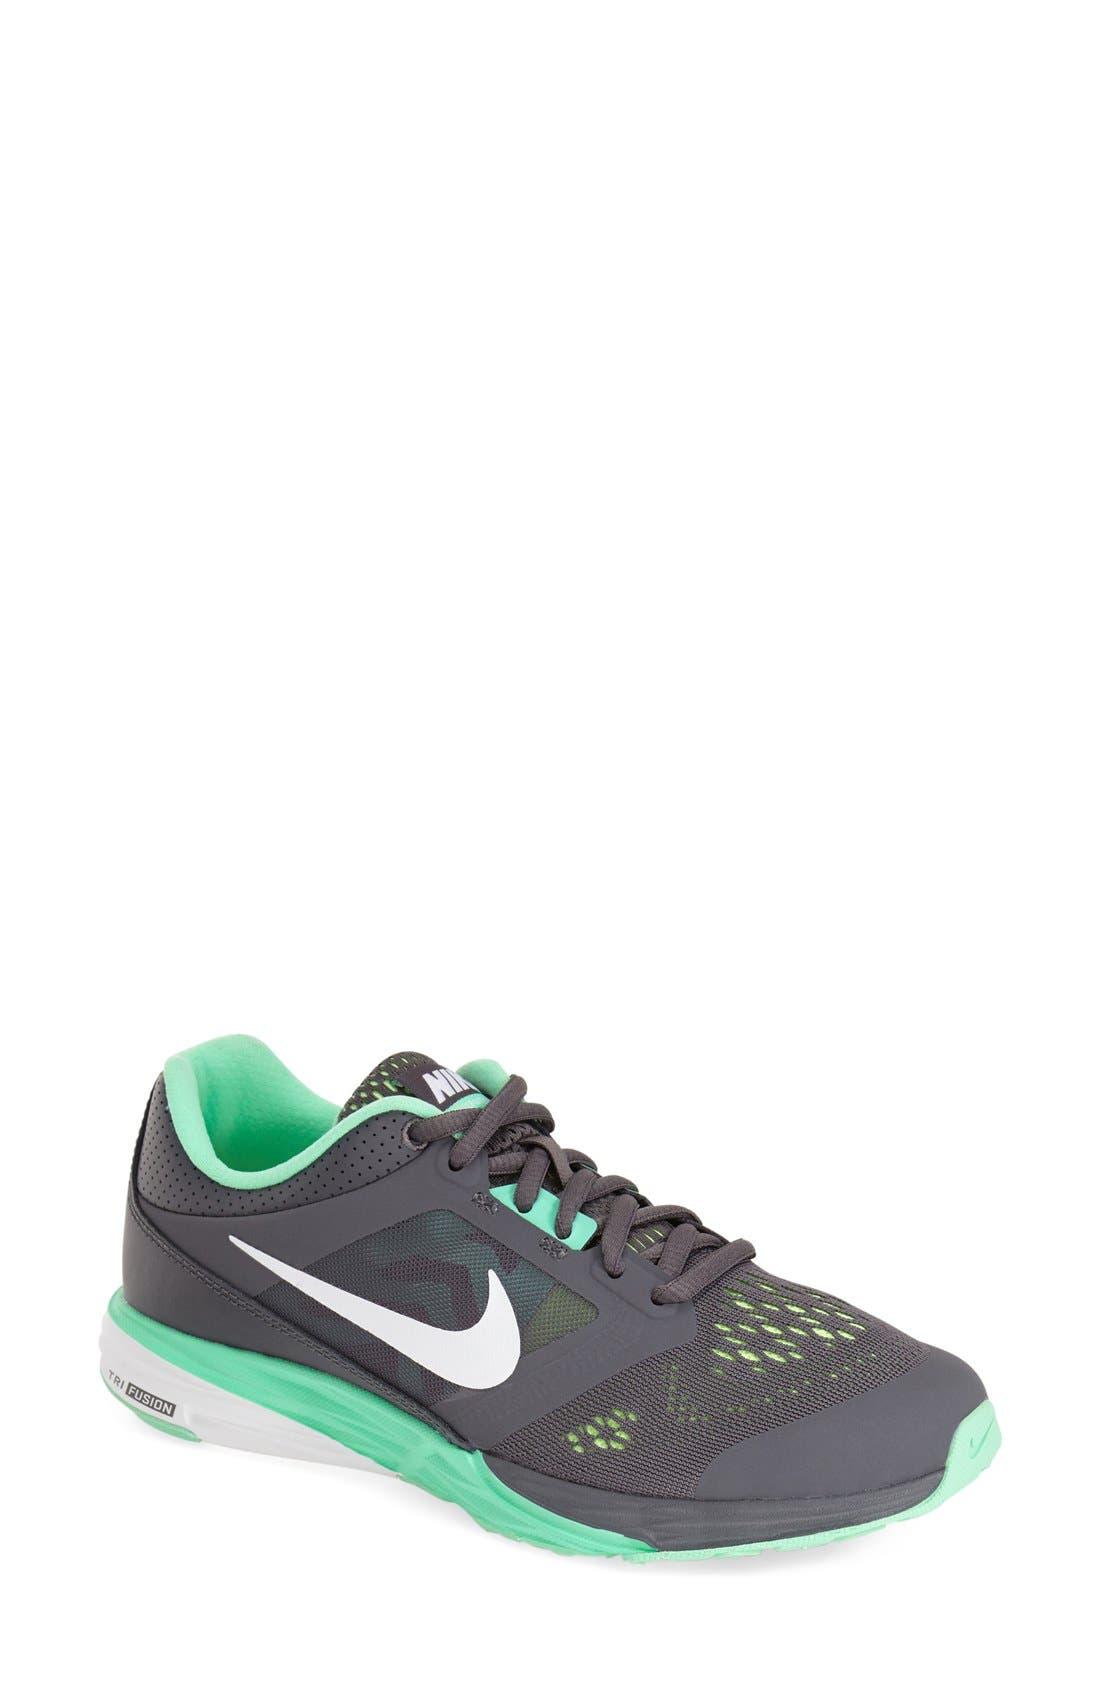 Alternate Image 1 Selected - Nike 'TriFusion' Running Shoe (Women)